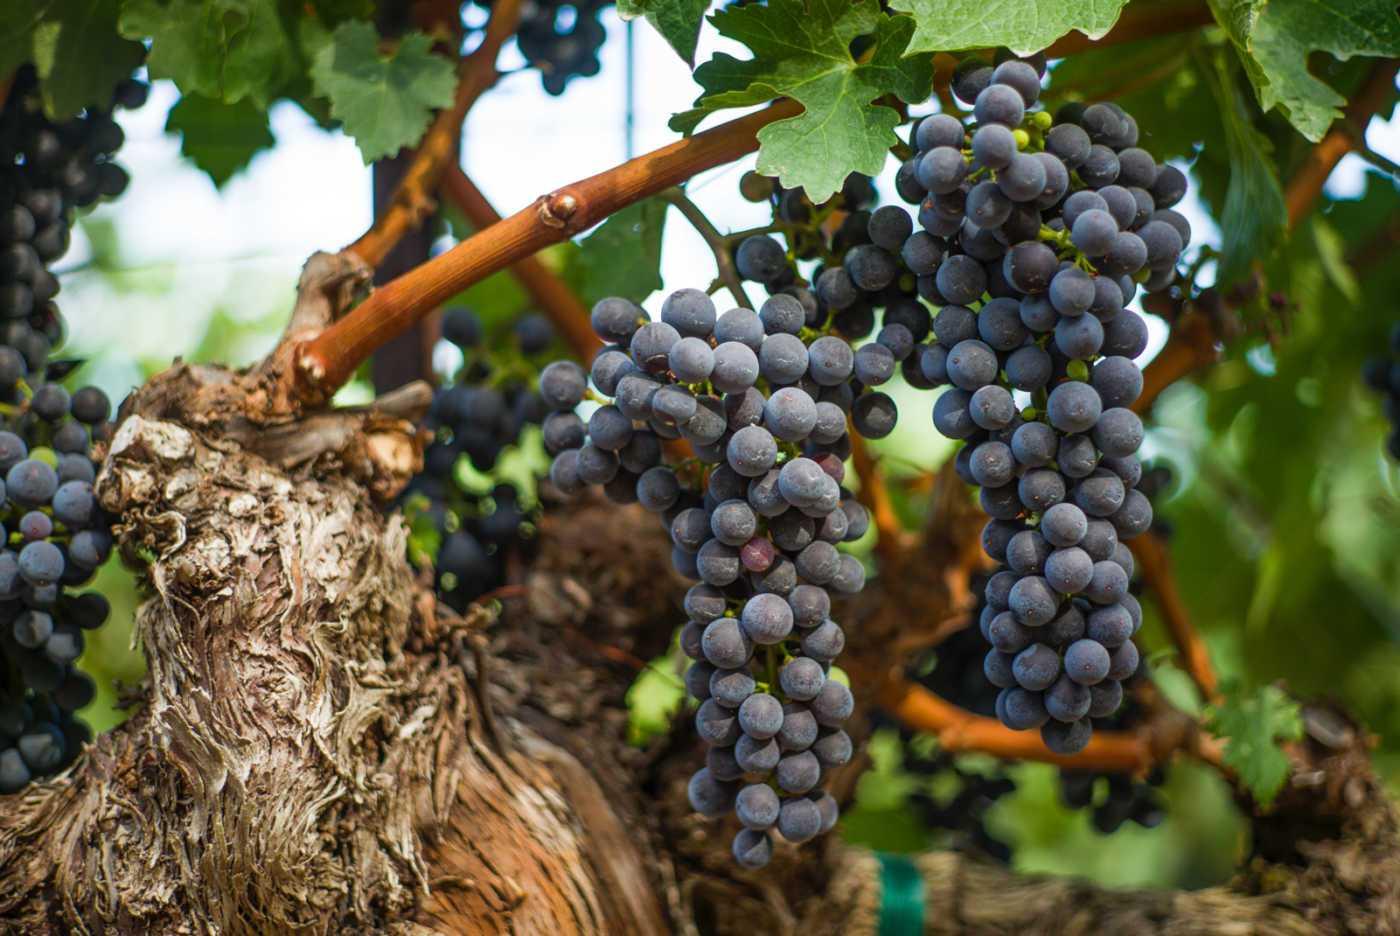 heimark grapes